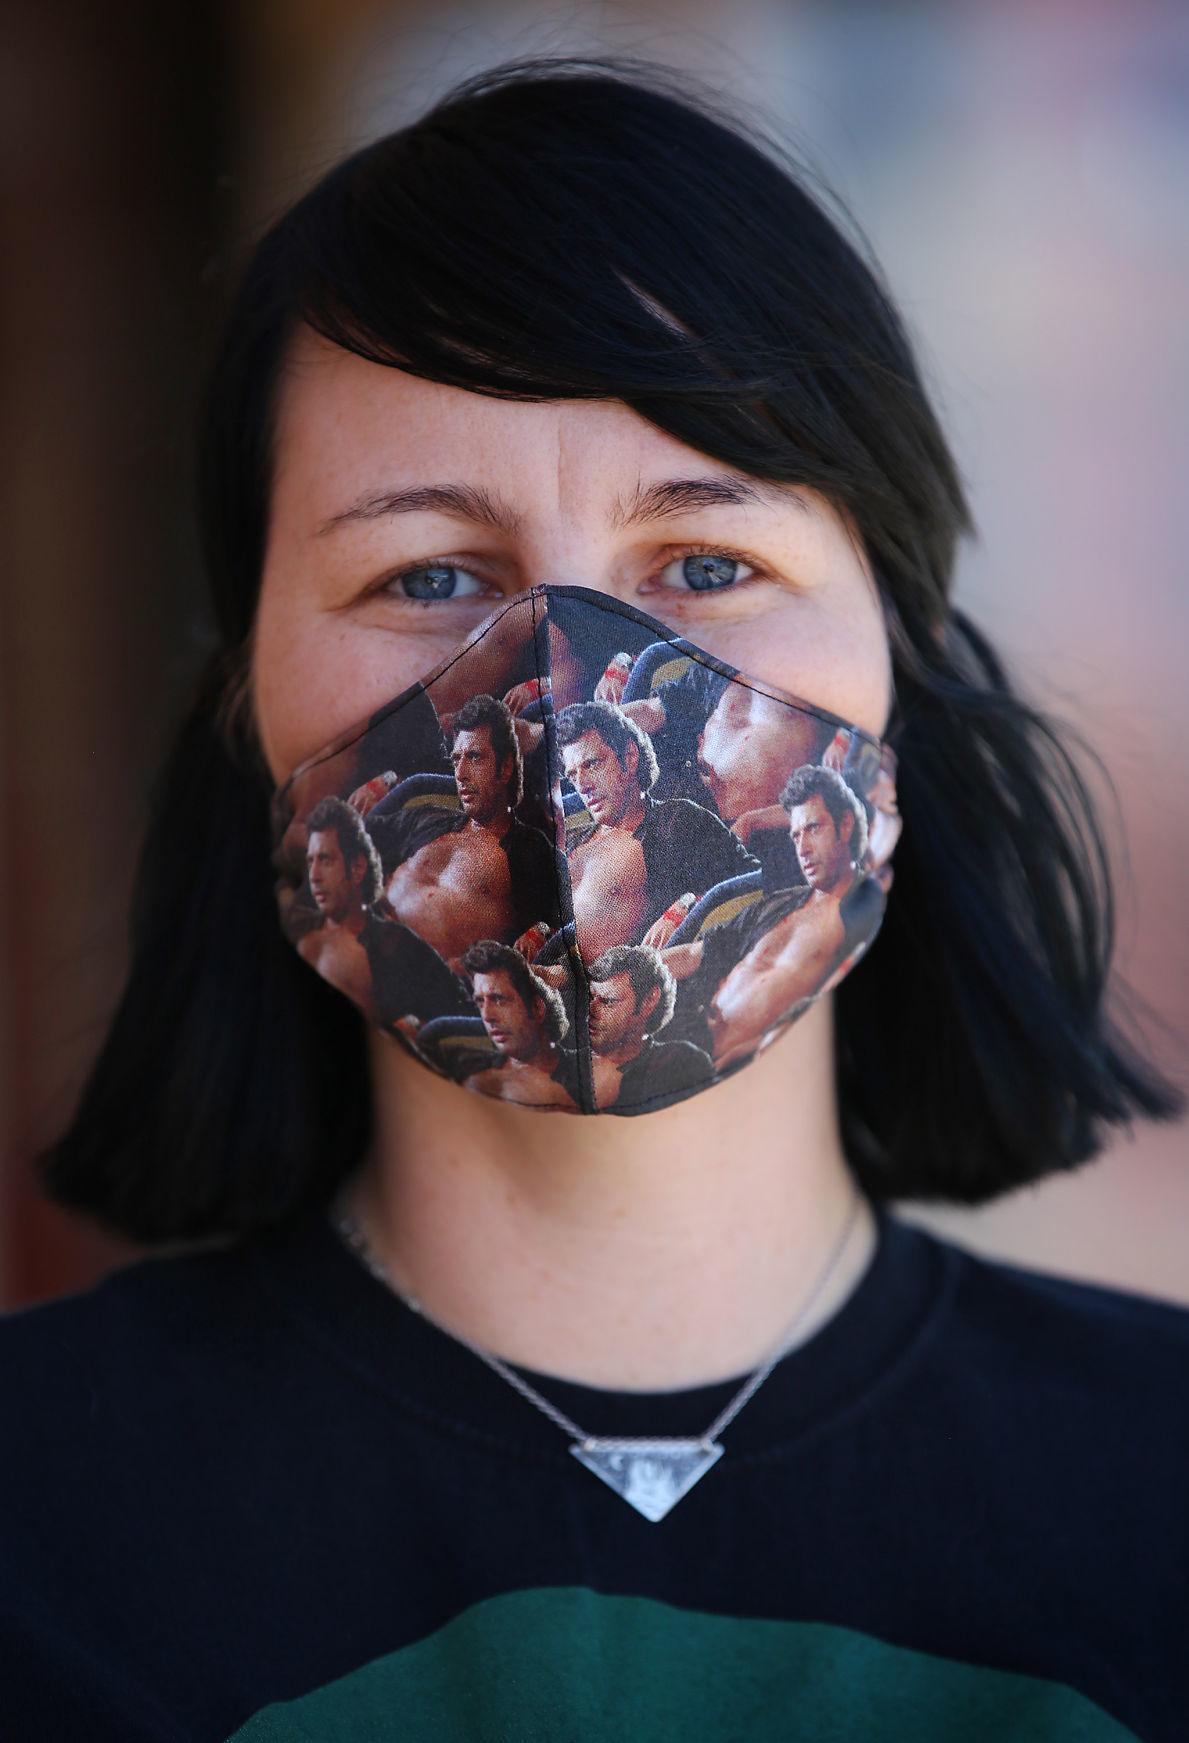 Tucson face masks: Kristina Michelle